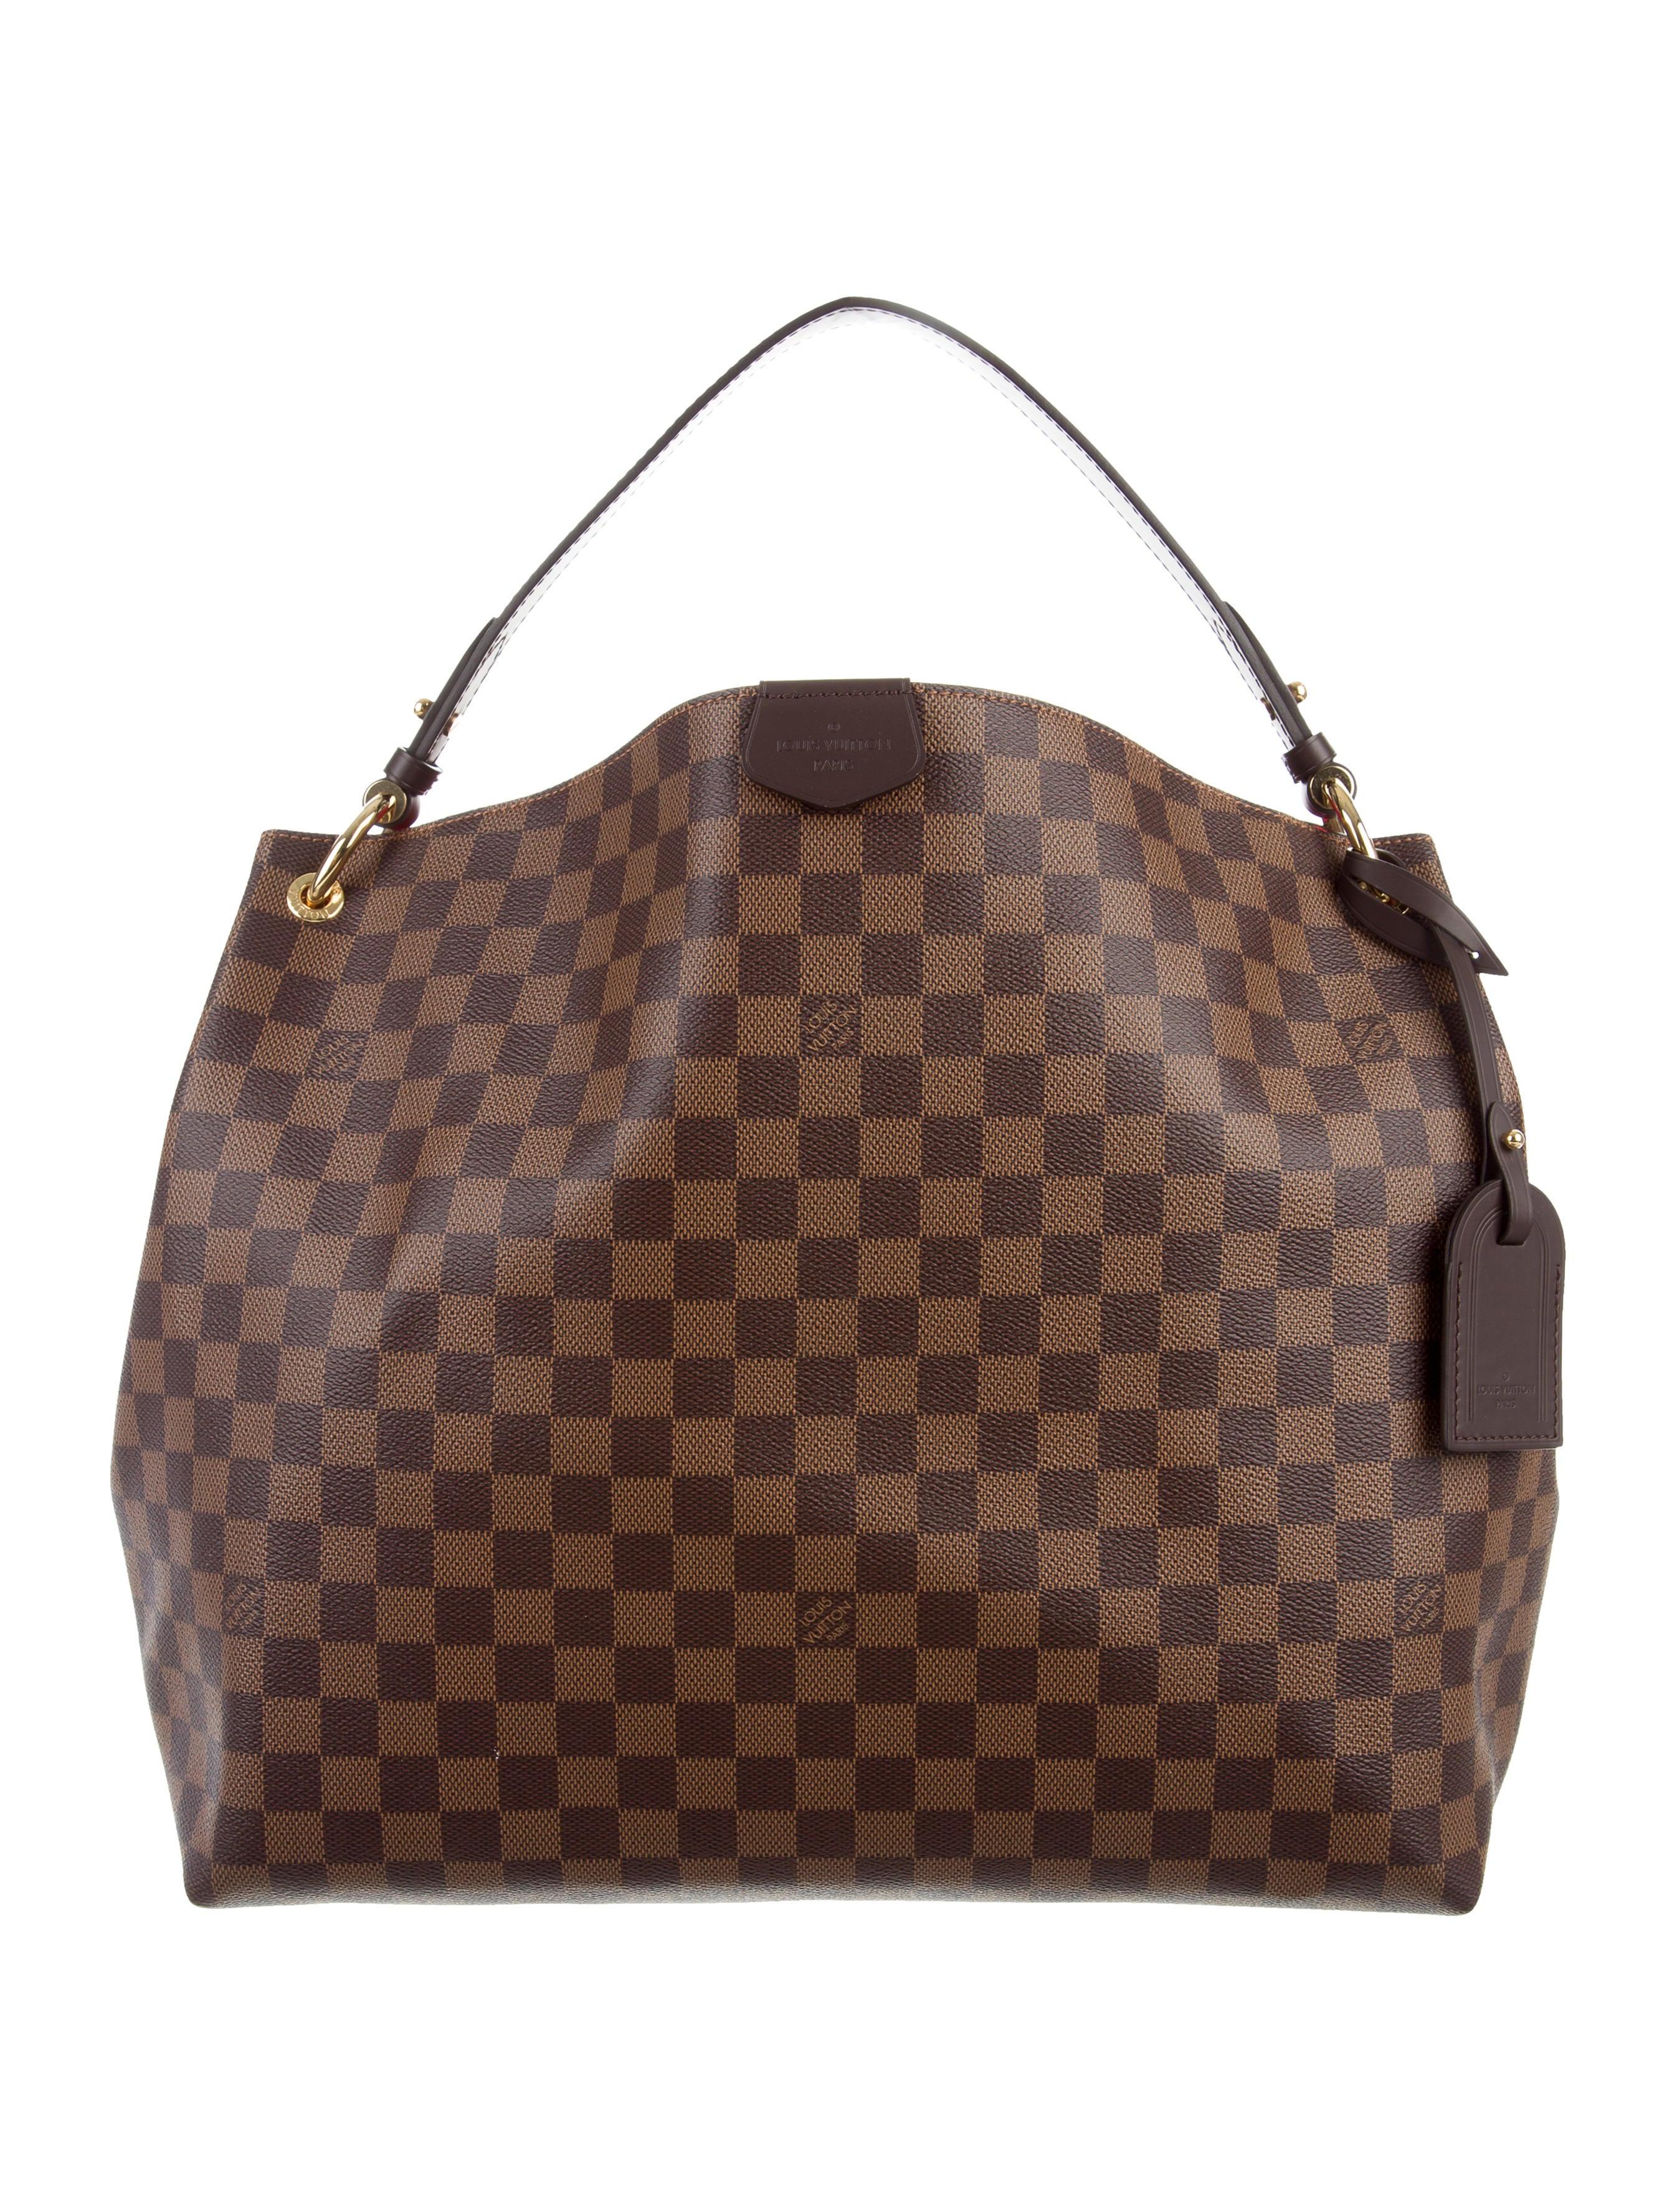 Louis Vuitton 2017 Damier Ebene Graceful MM - Handbags - LOU139491 ... bda11b5e2163c